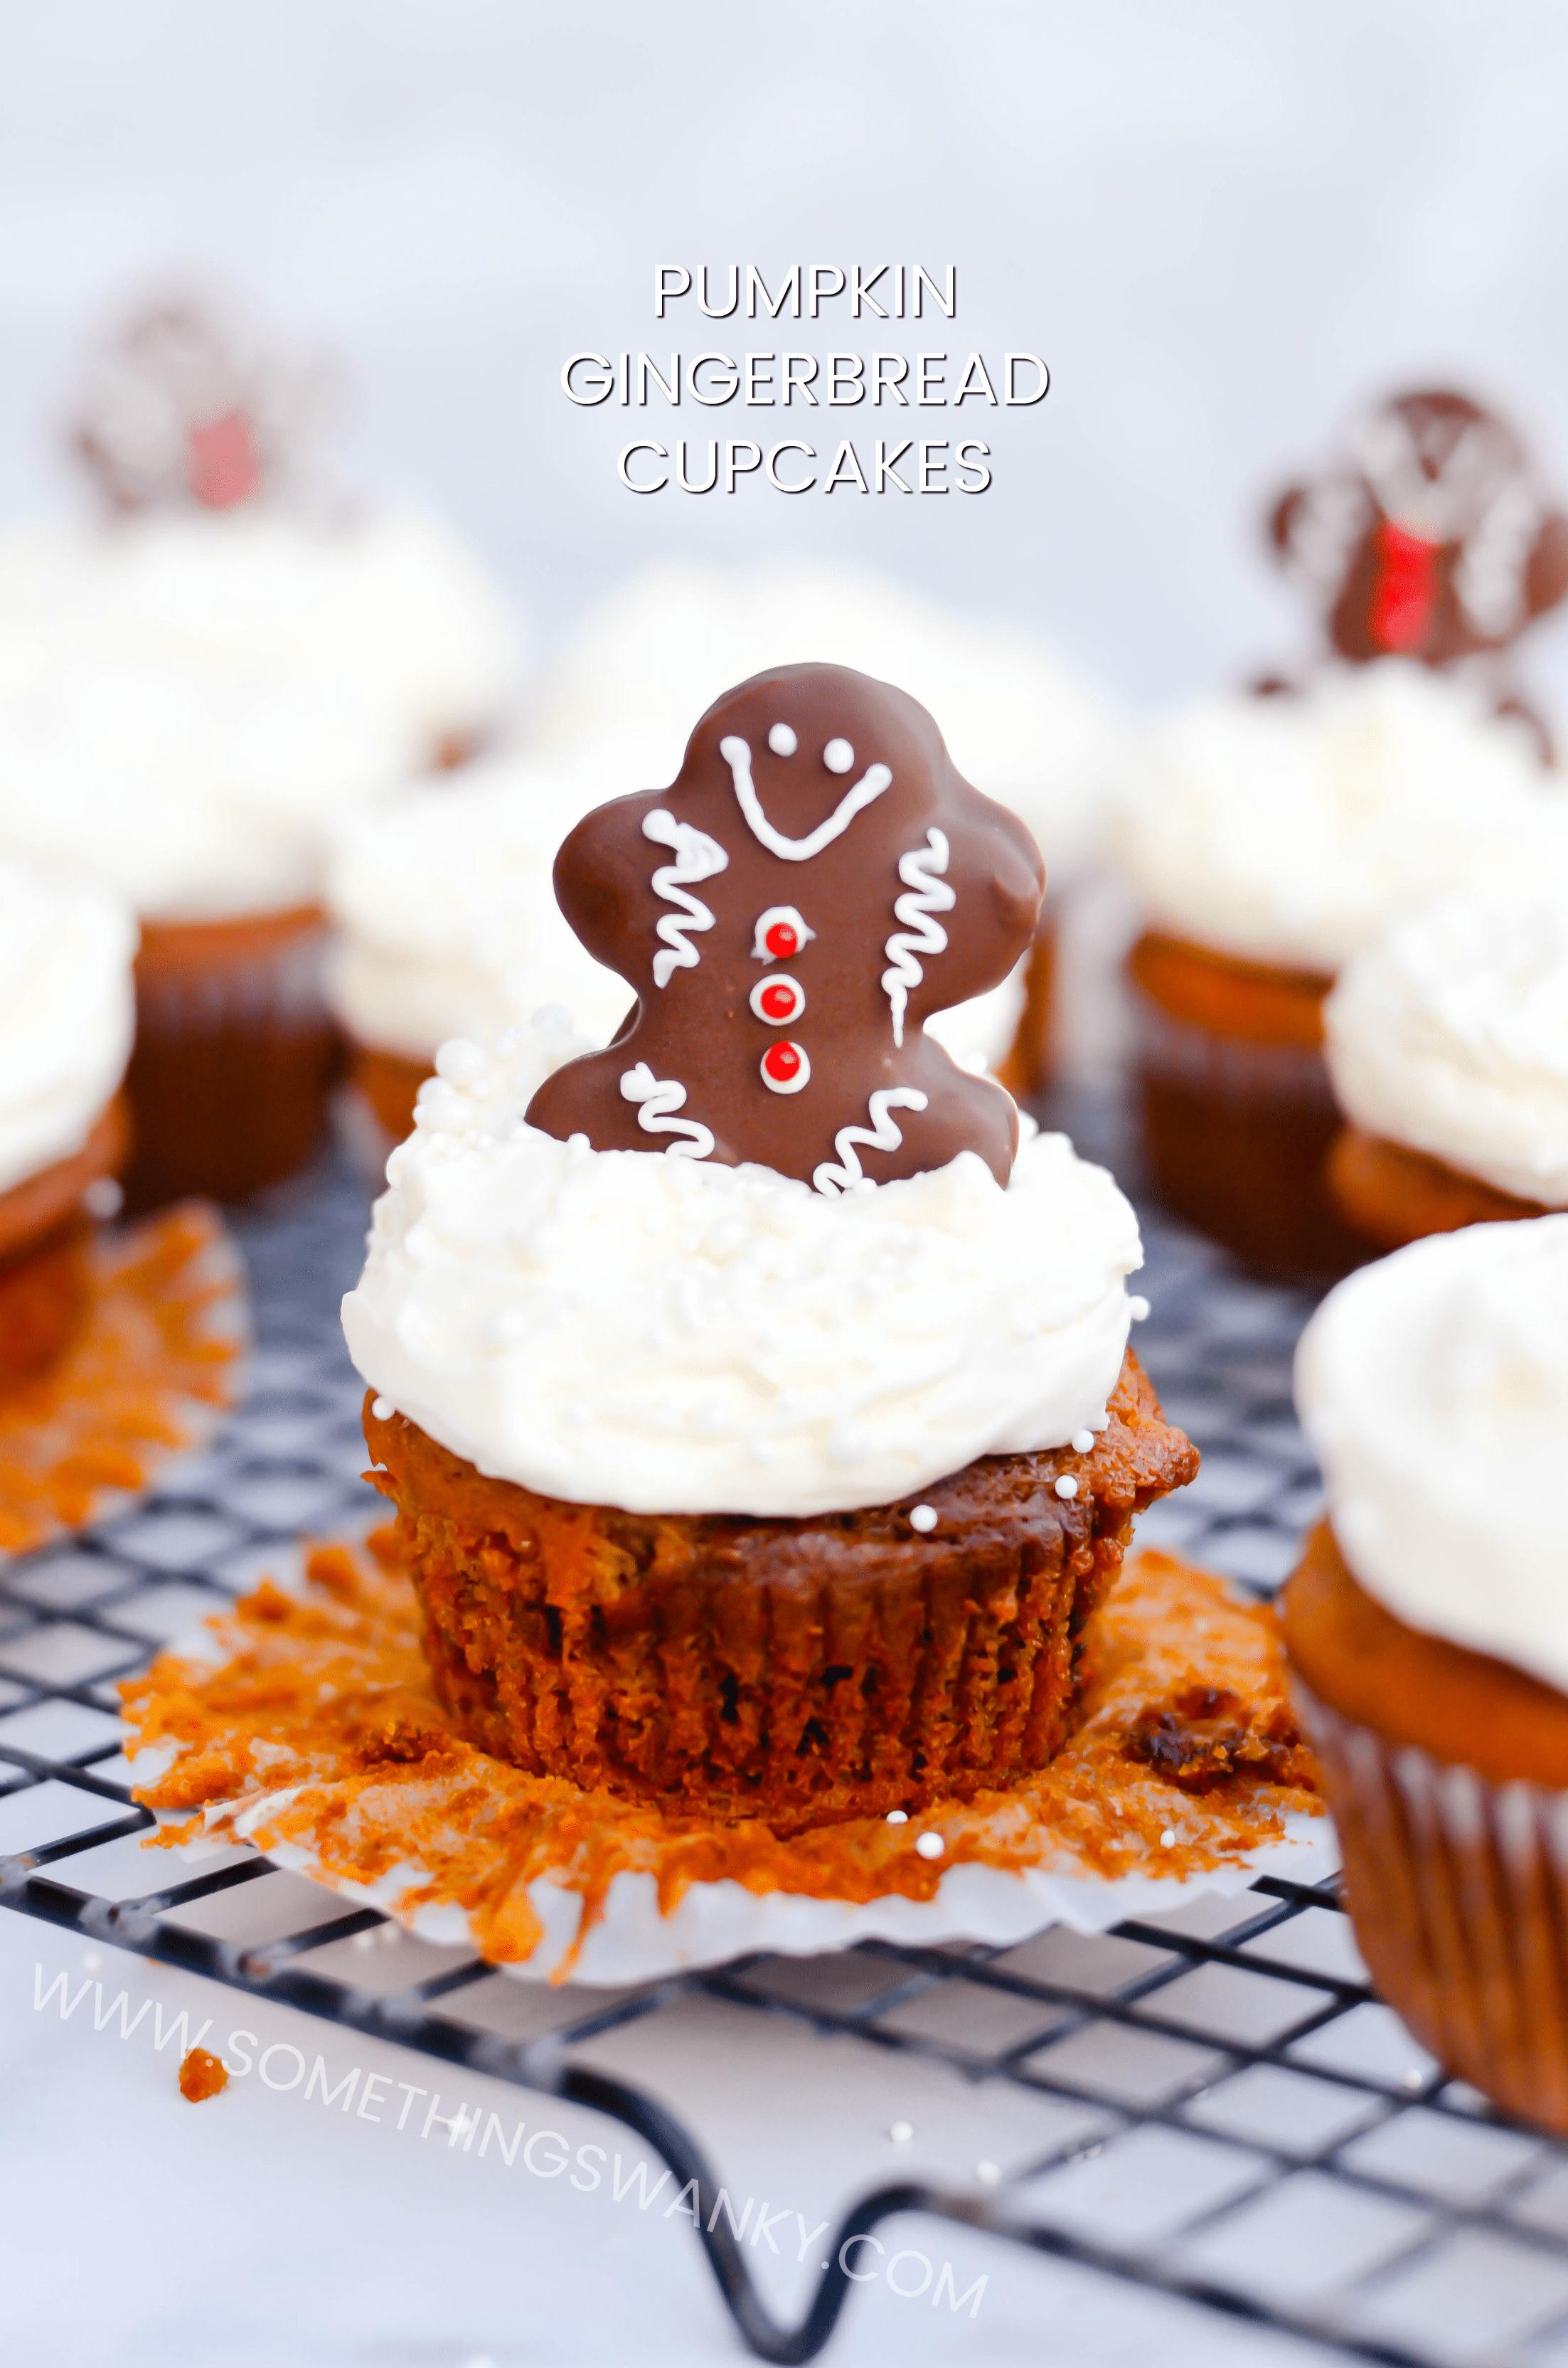 Pumpkin Gingerbread Cupcakes